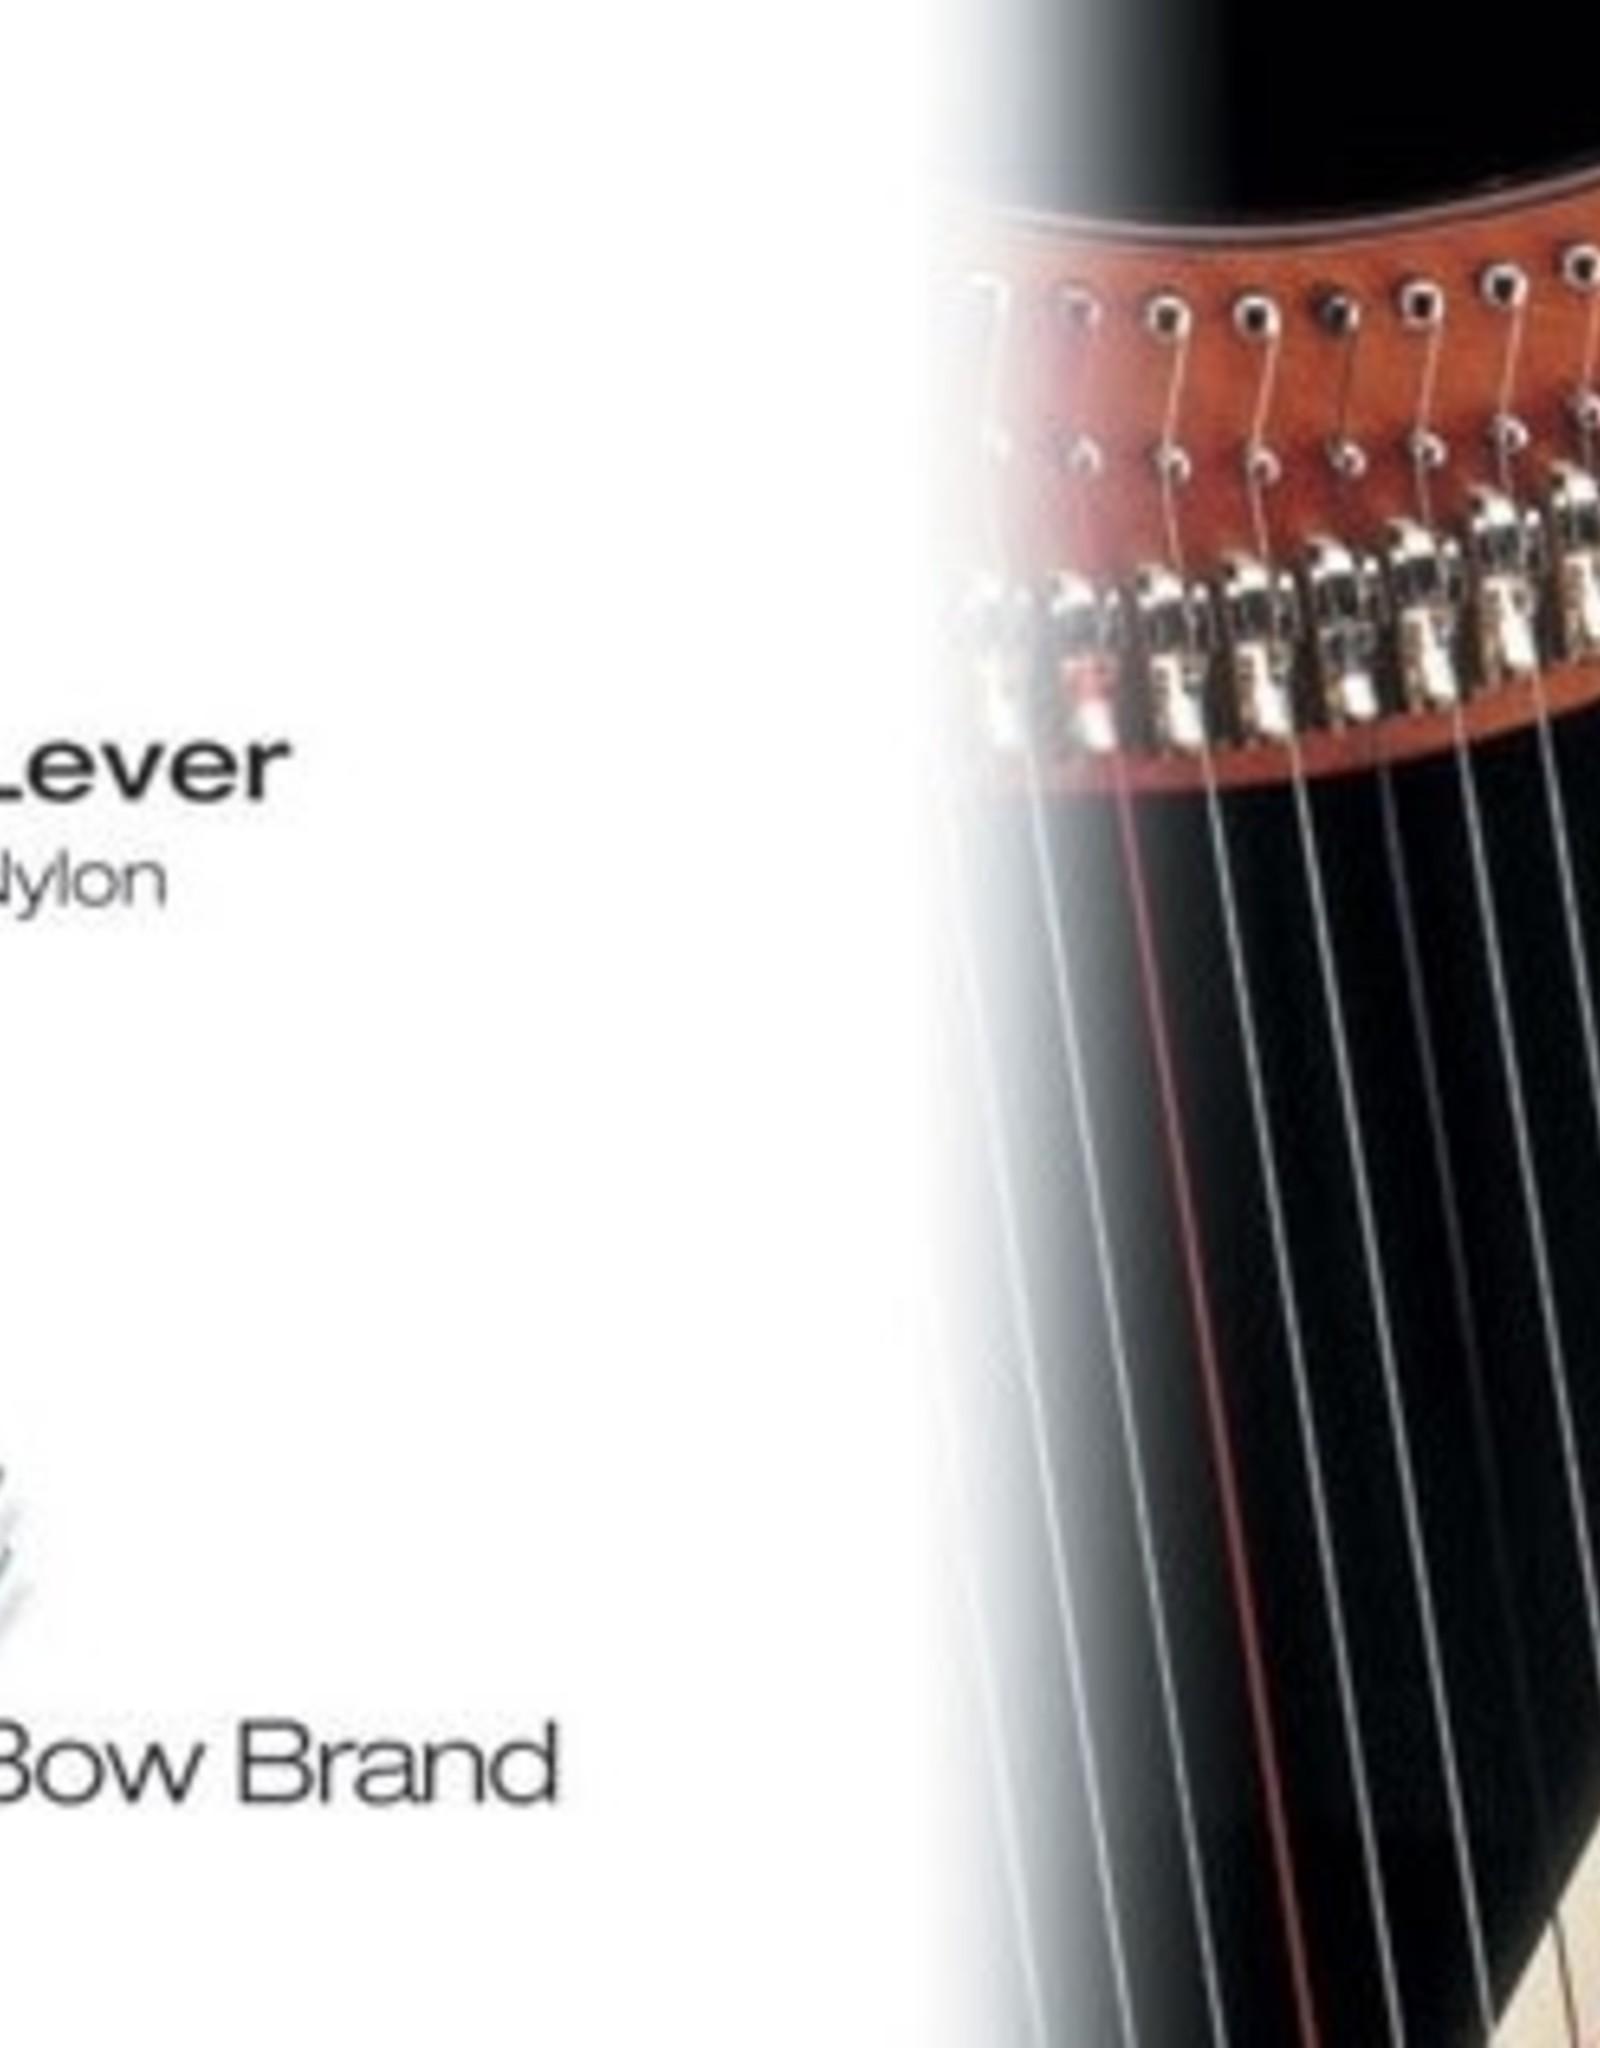 BOW BRAND  klep nylon - lever NYLON 30/5 re